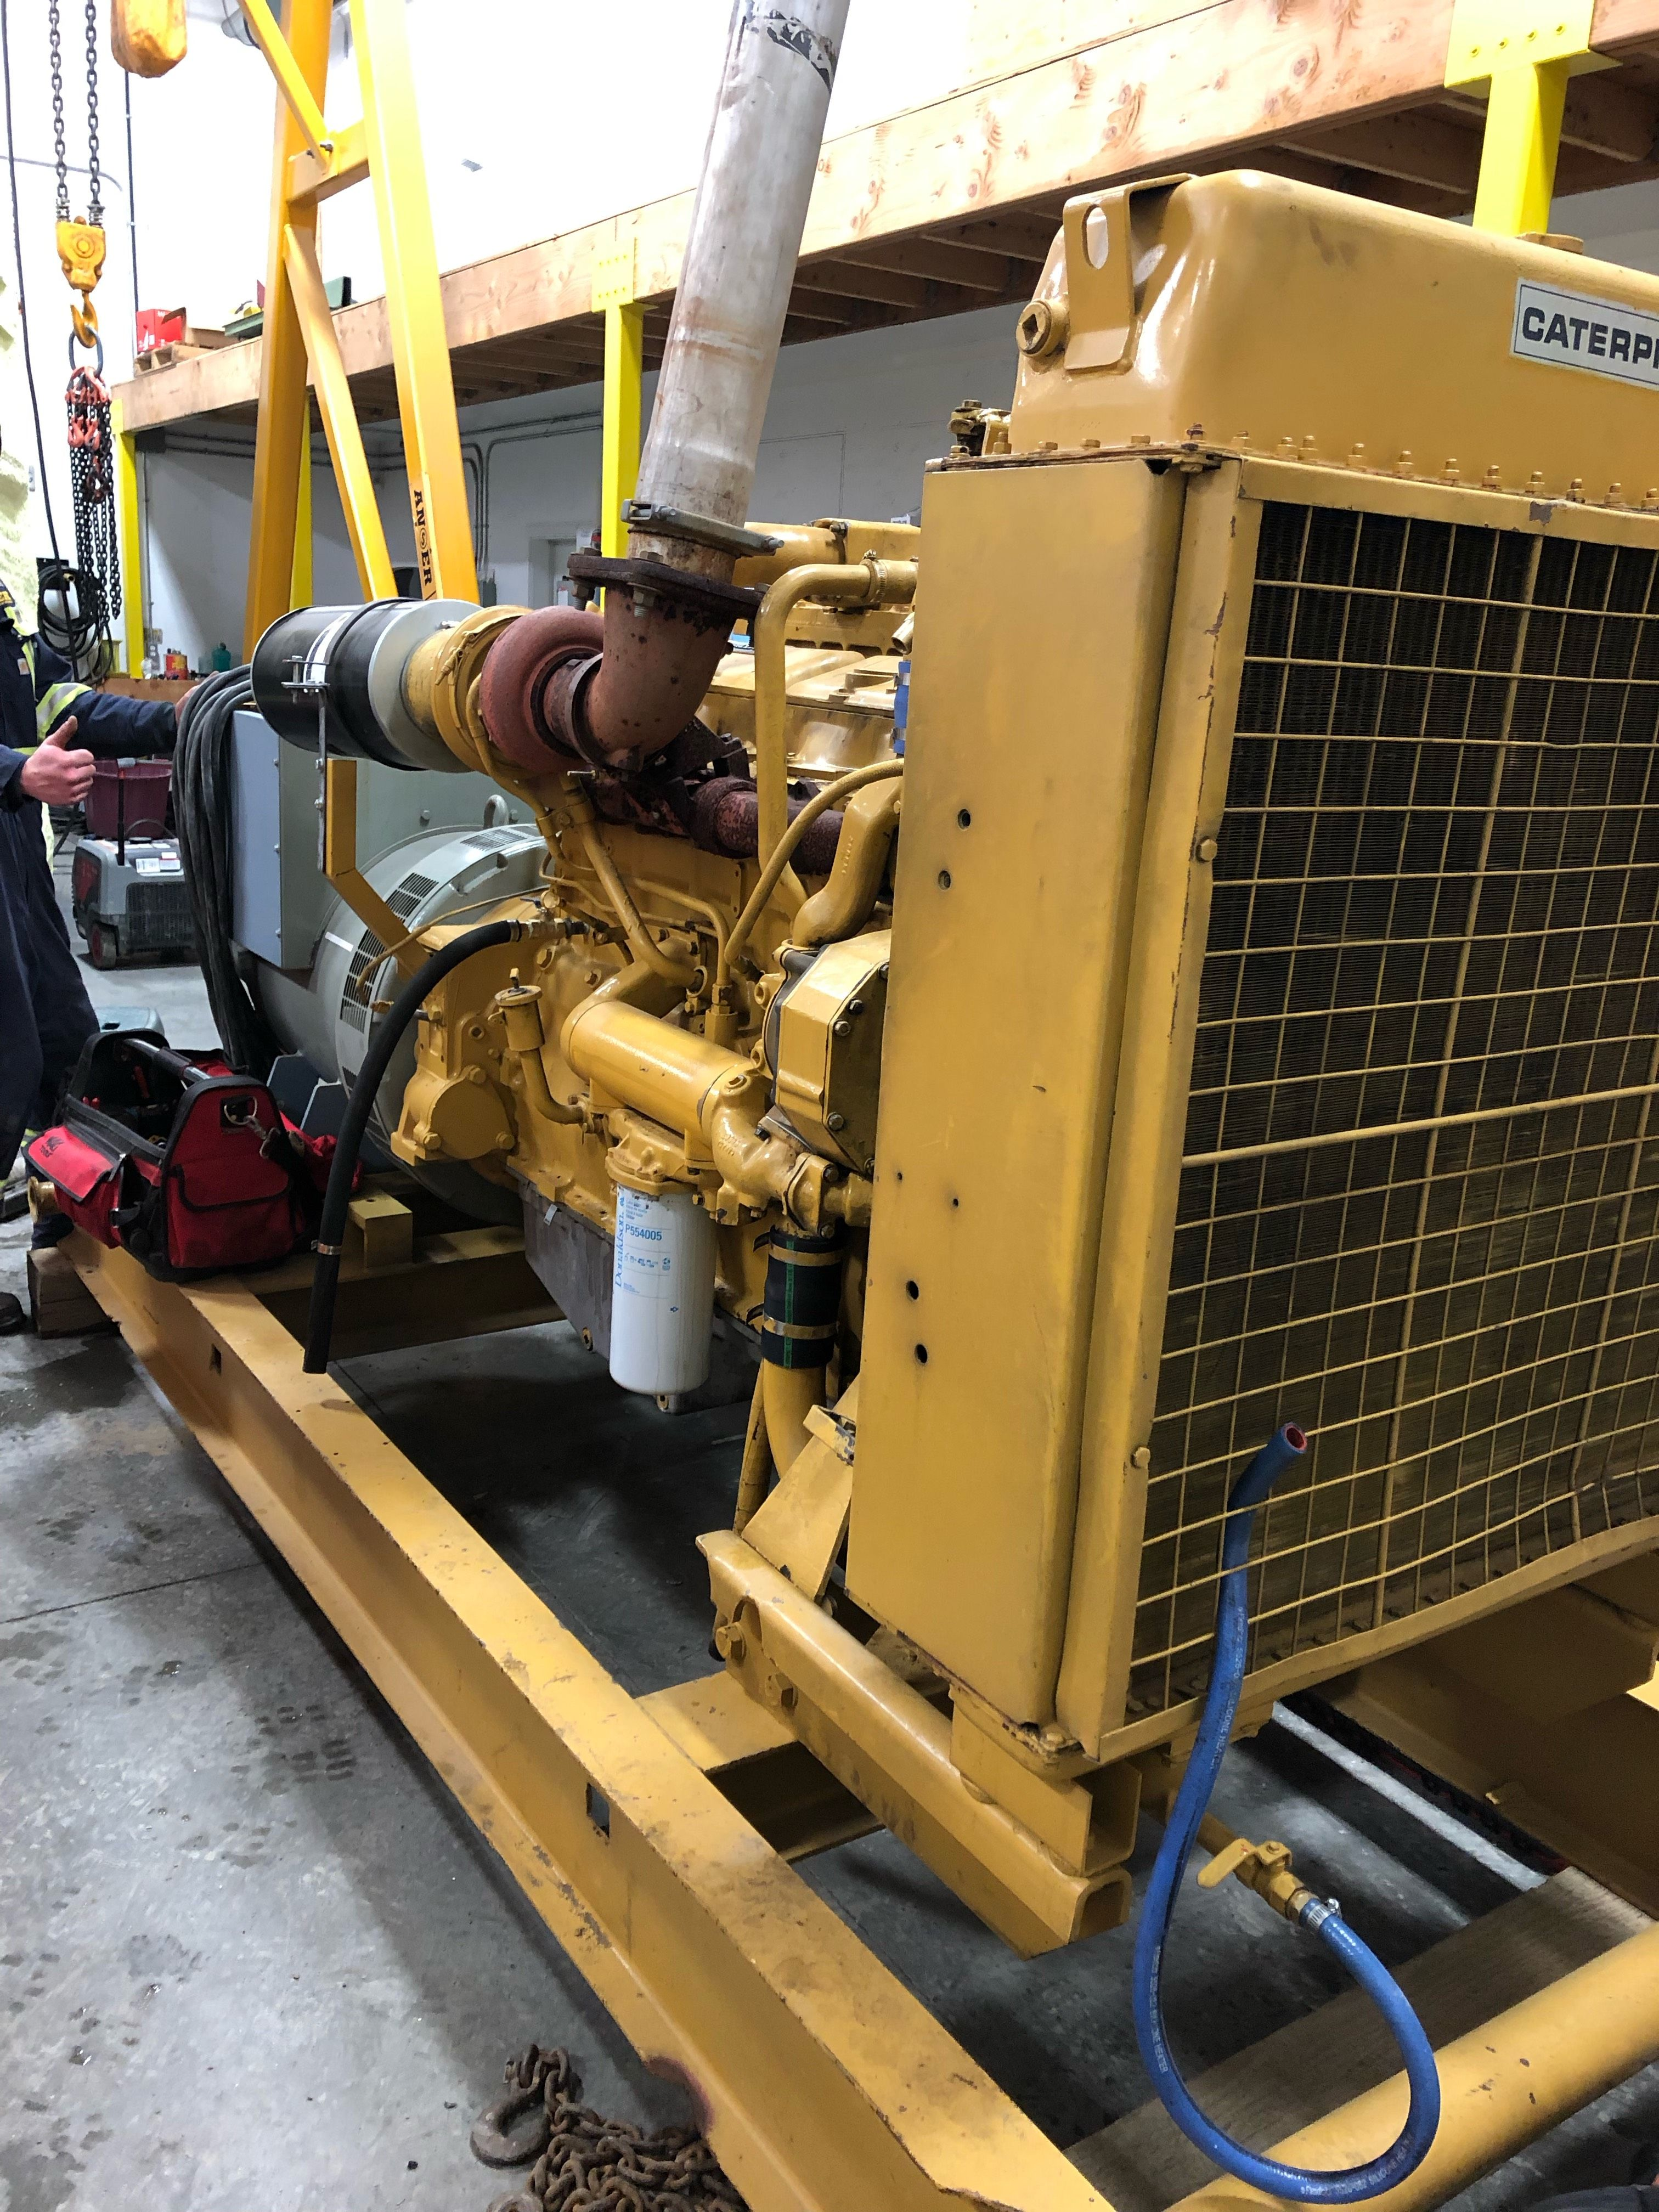 Caterpillar Genset Generators for sale, Used generators